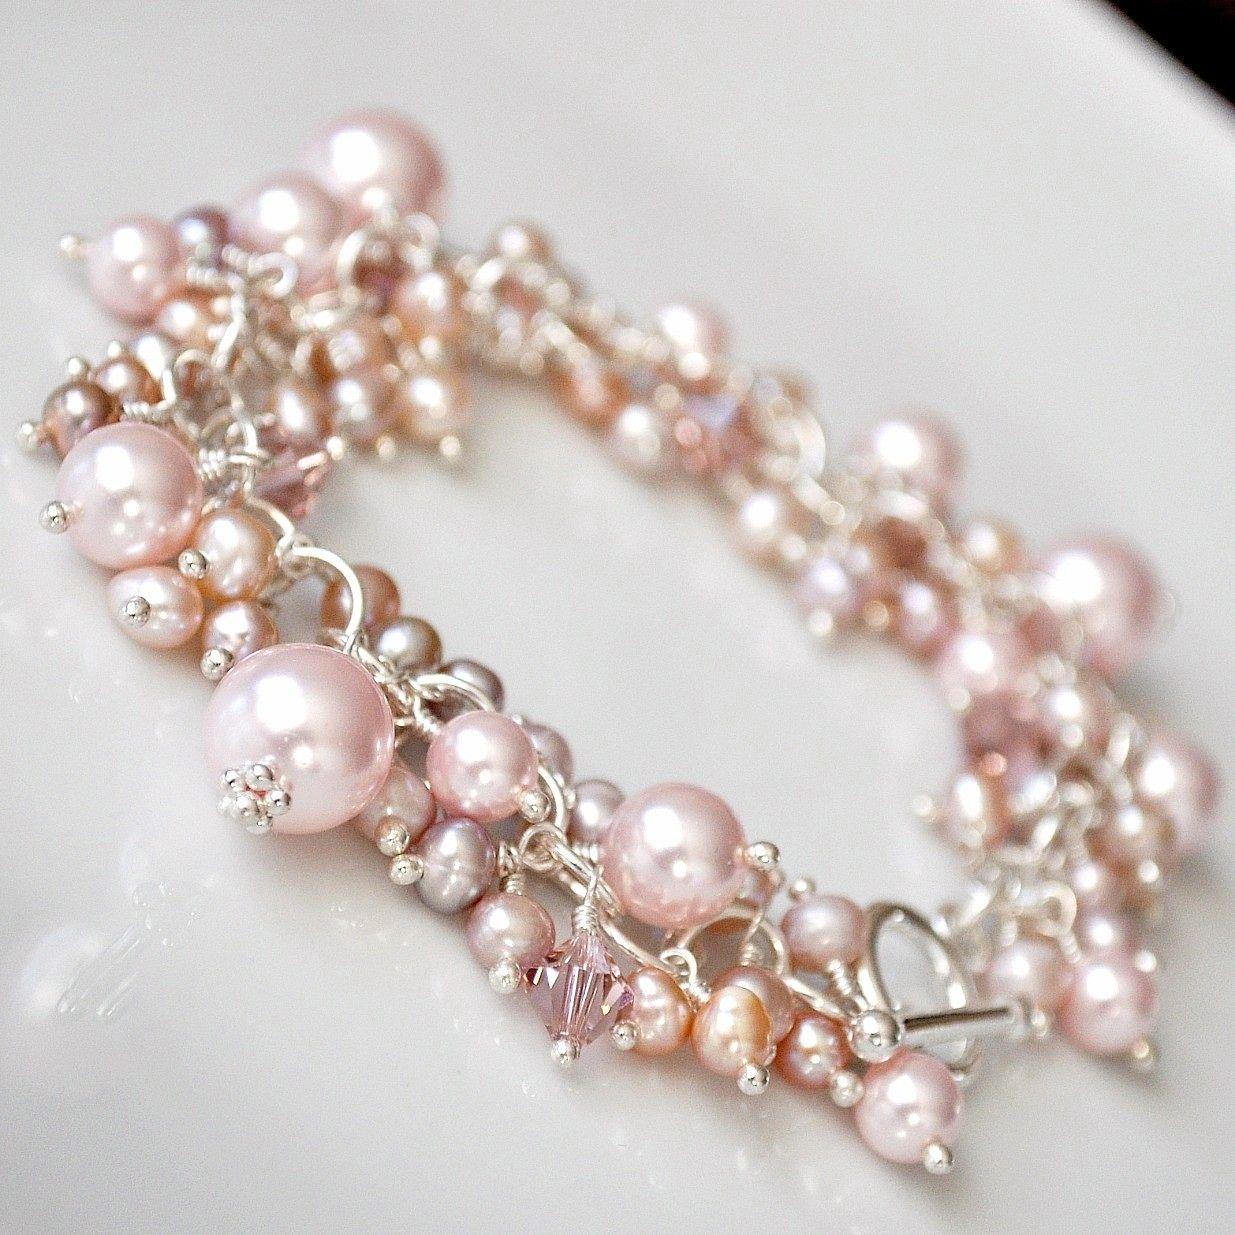 Mother of the Groom Mother of the Bride Chunky Bridal Bracelet Rose Gold Crystal Wedding Bracelet Bridal Accessories